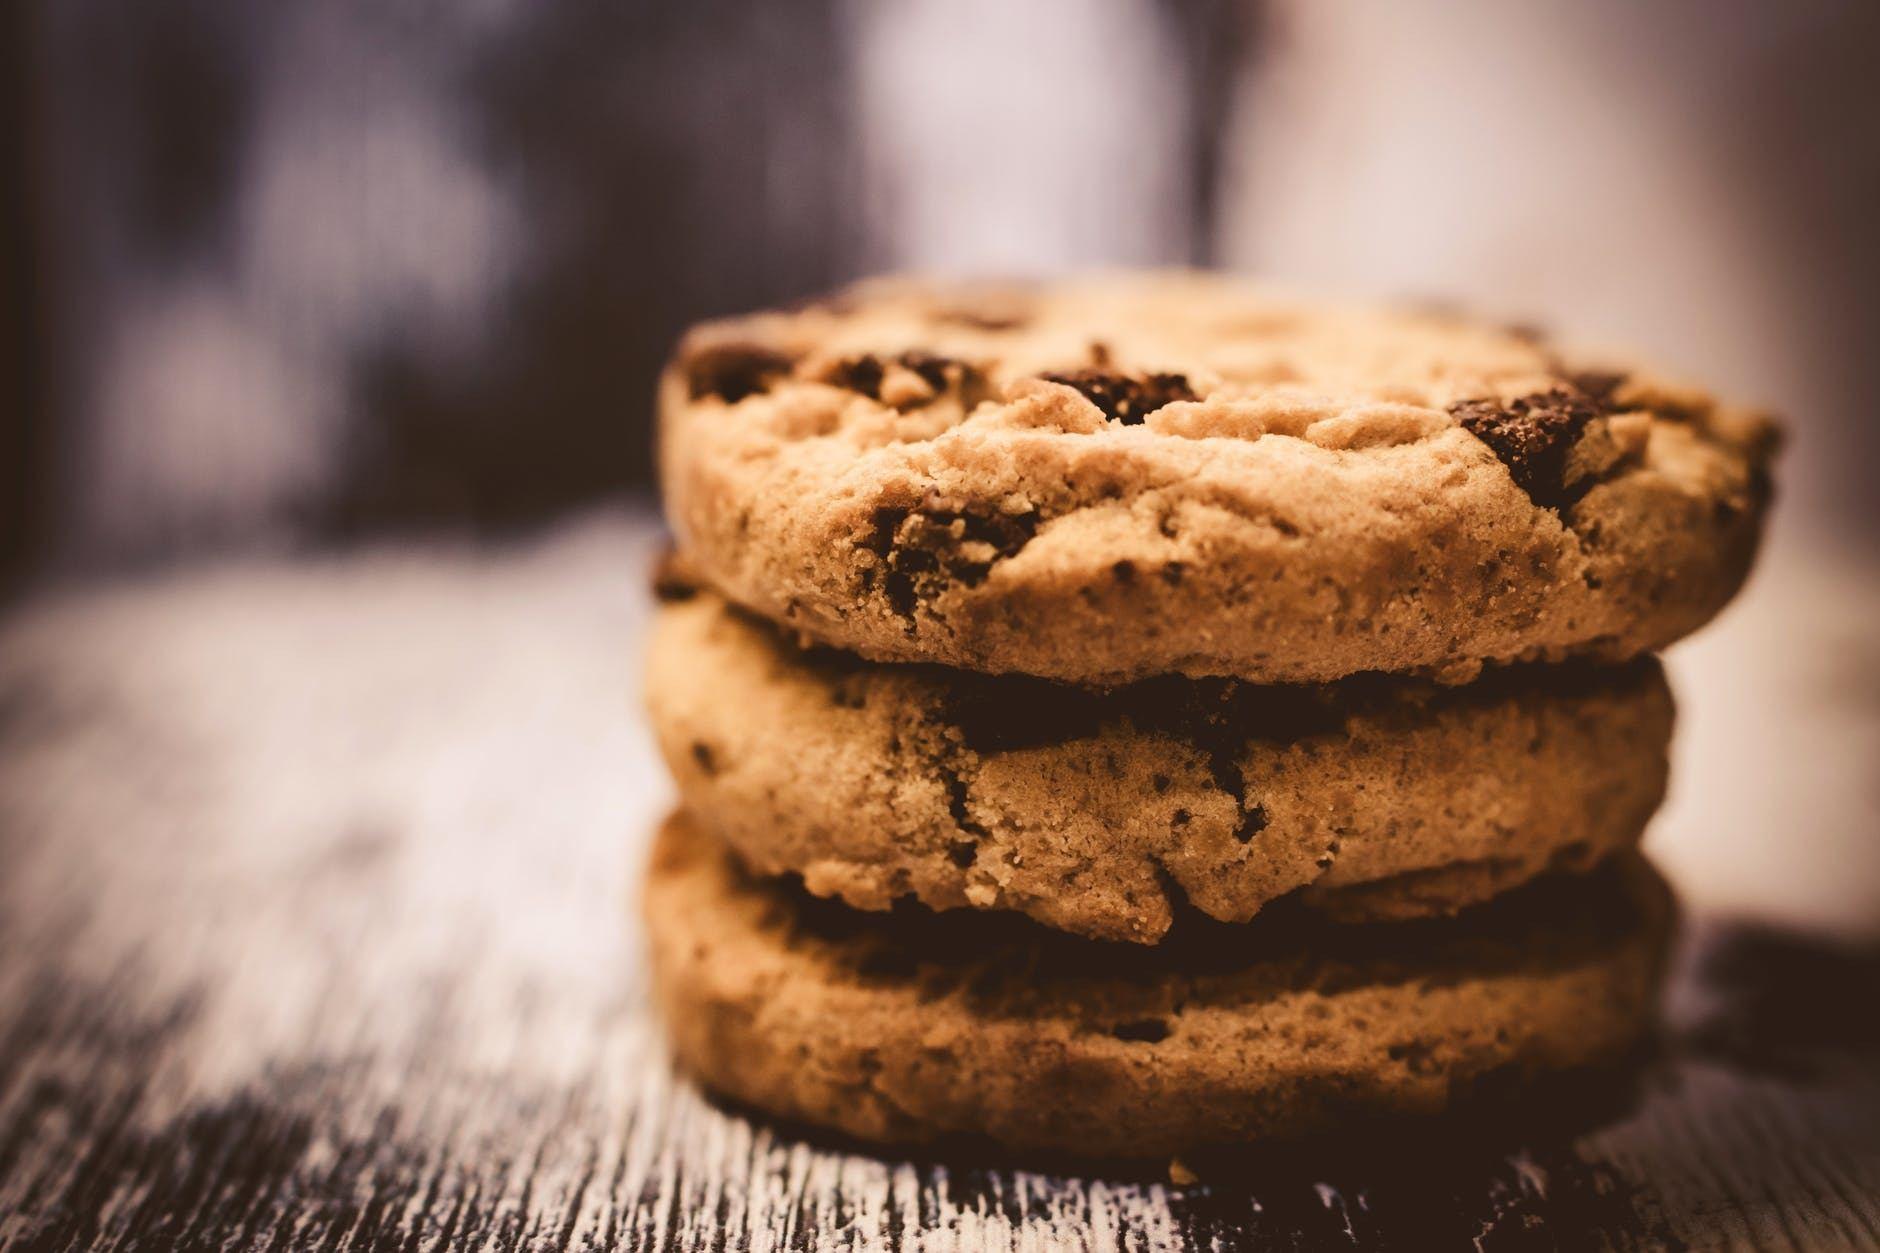 eat less junk food, freelance wellness